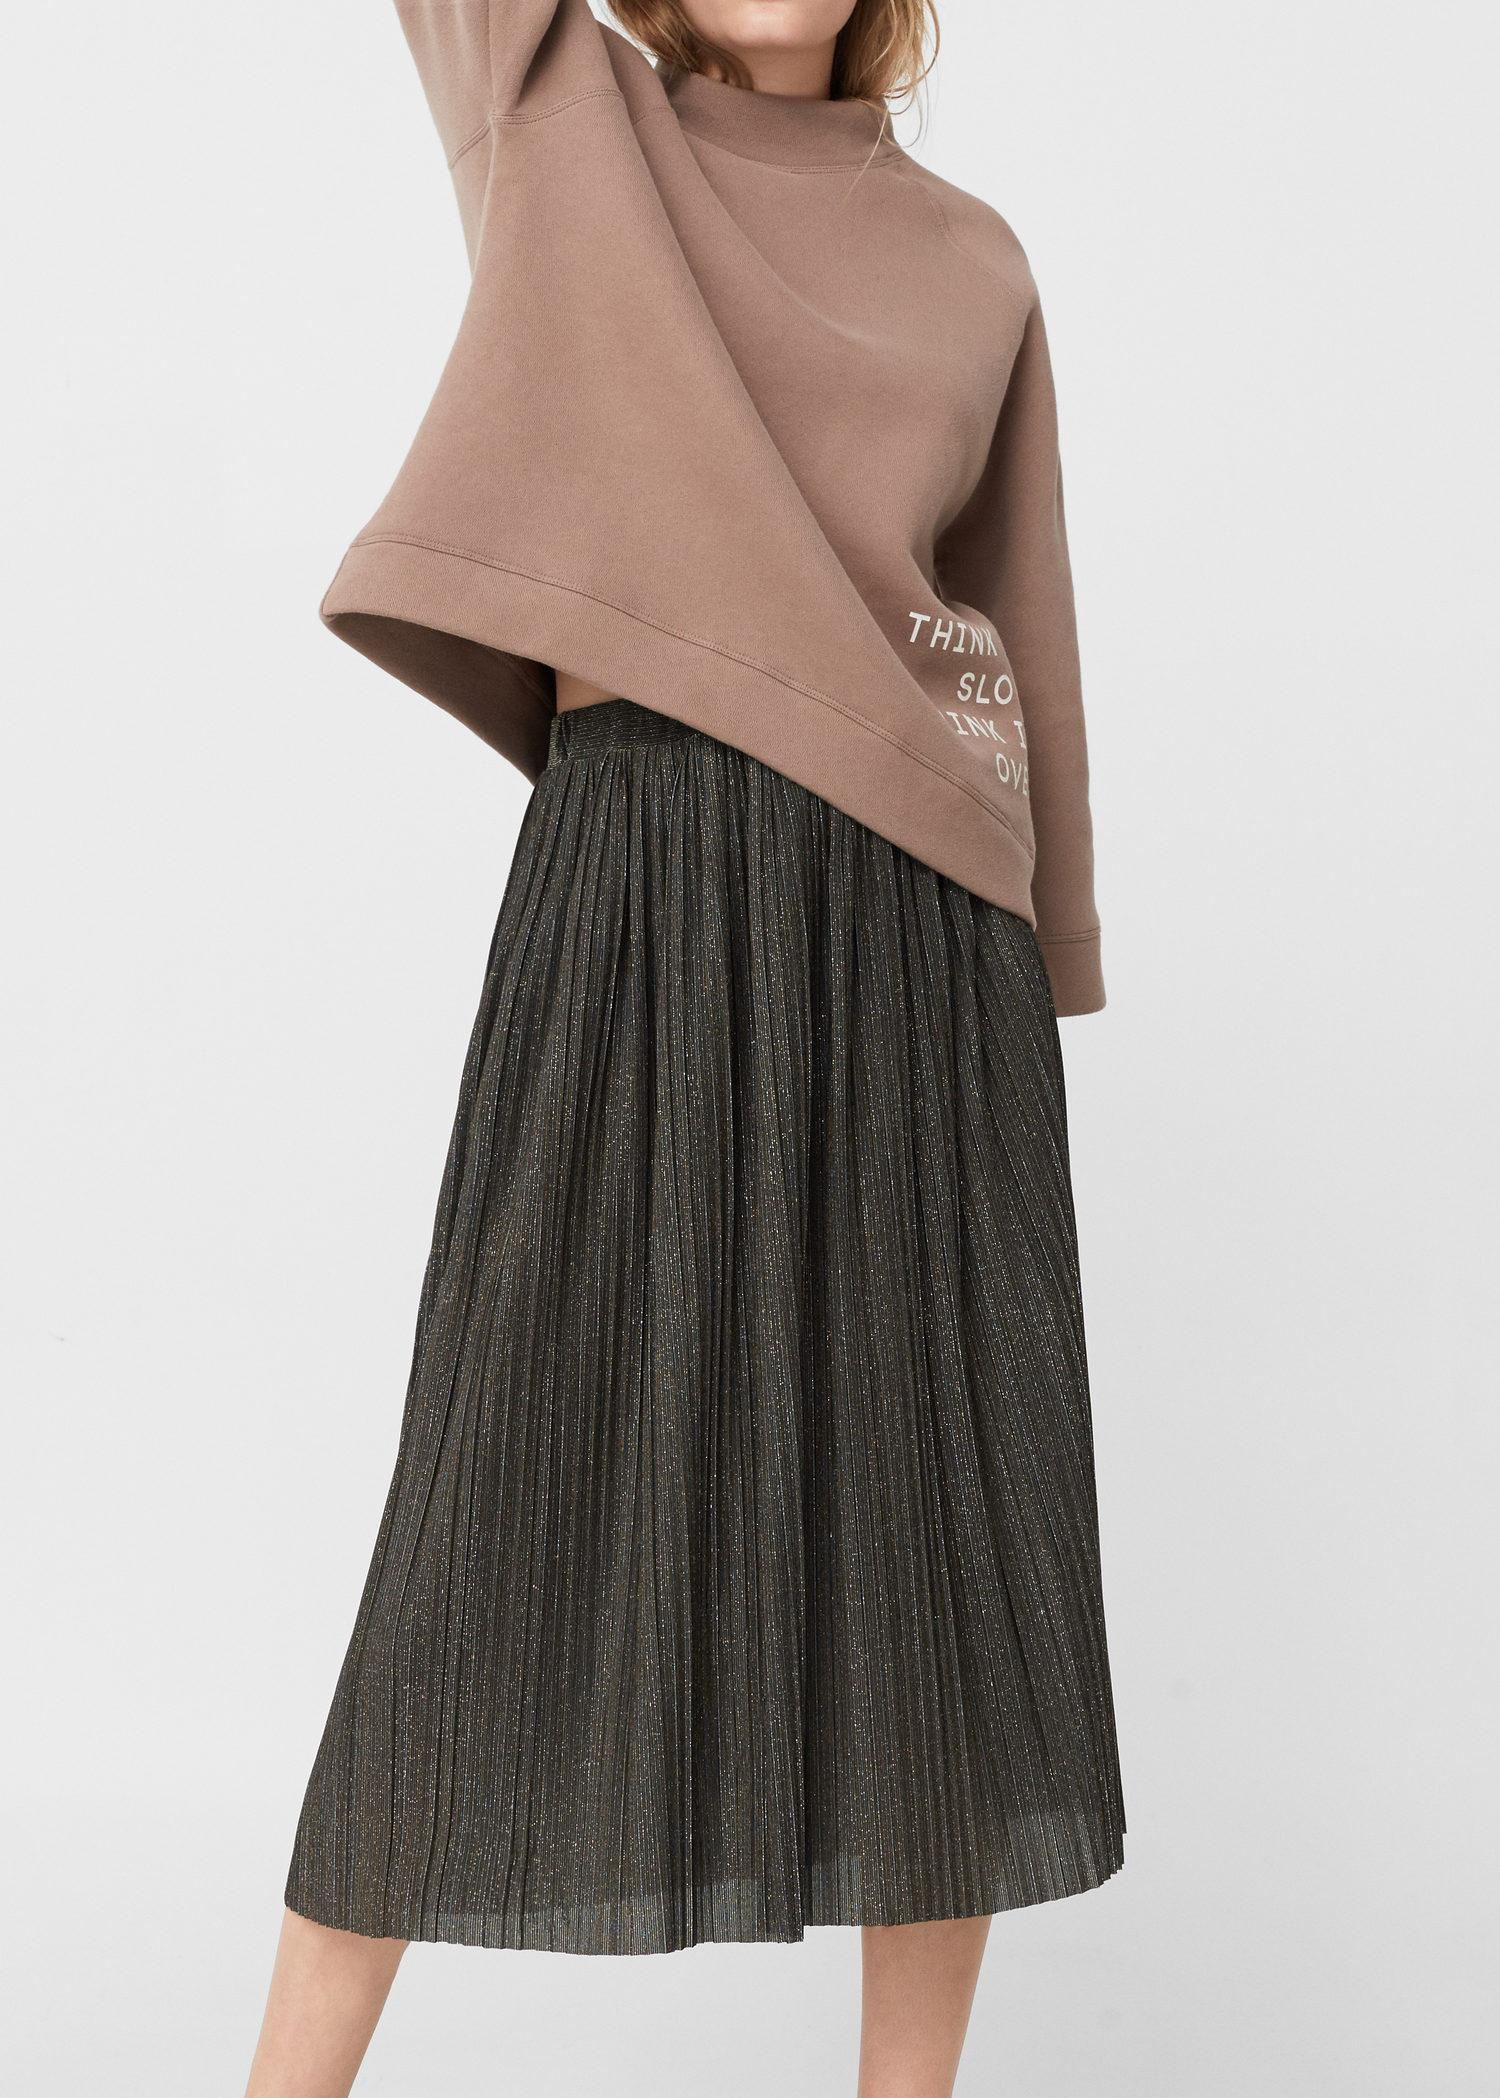 18a71aa8cf Mango Pleated Midi Skirt in Metallic - Lyst